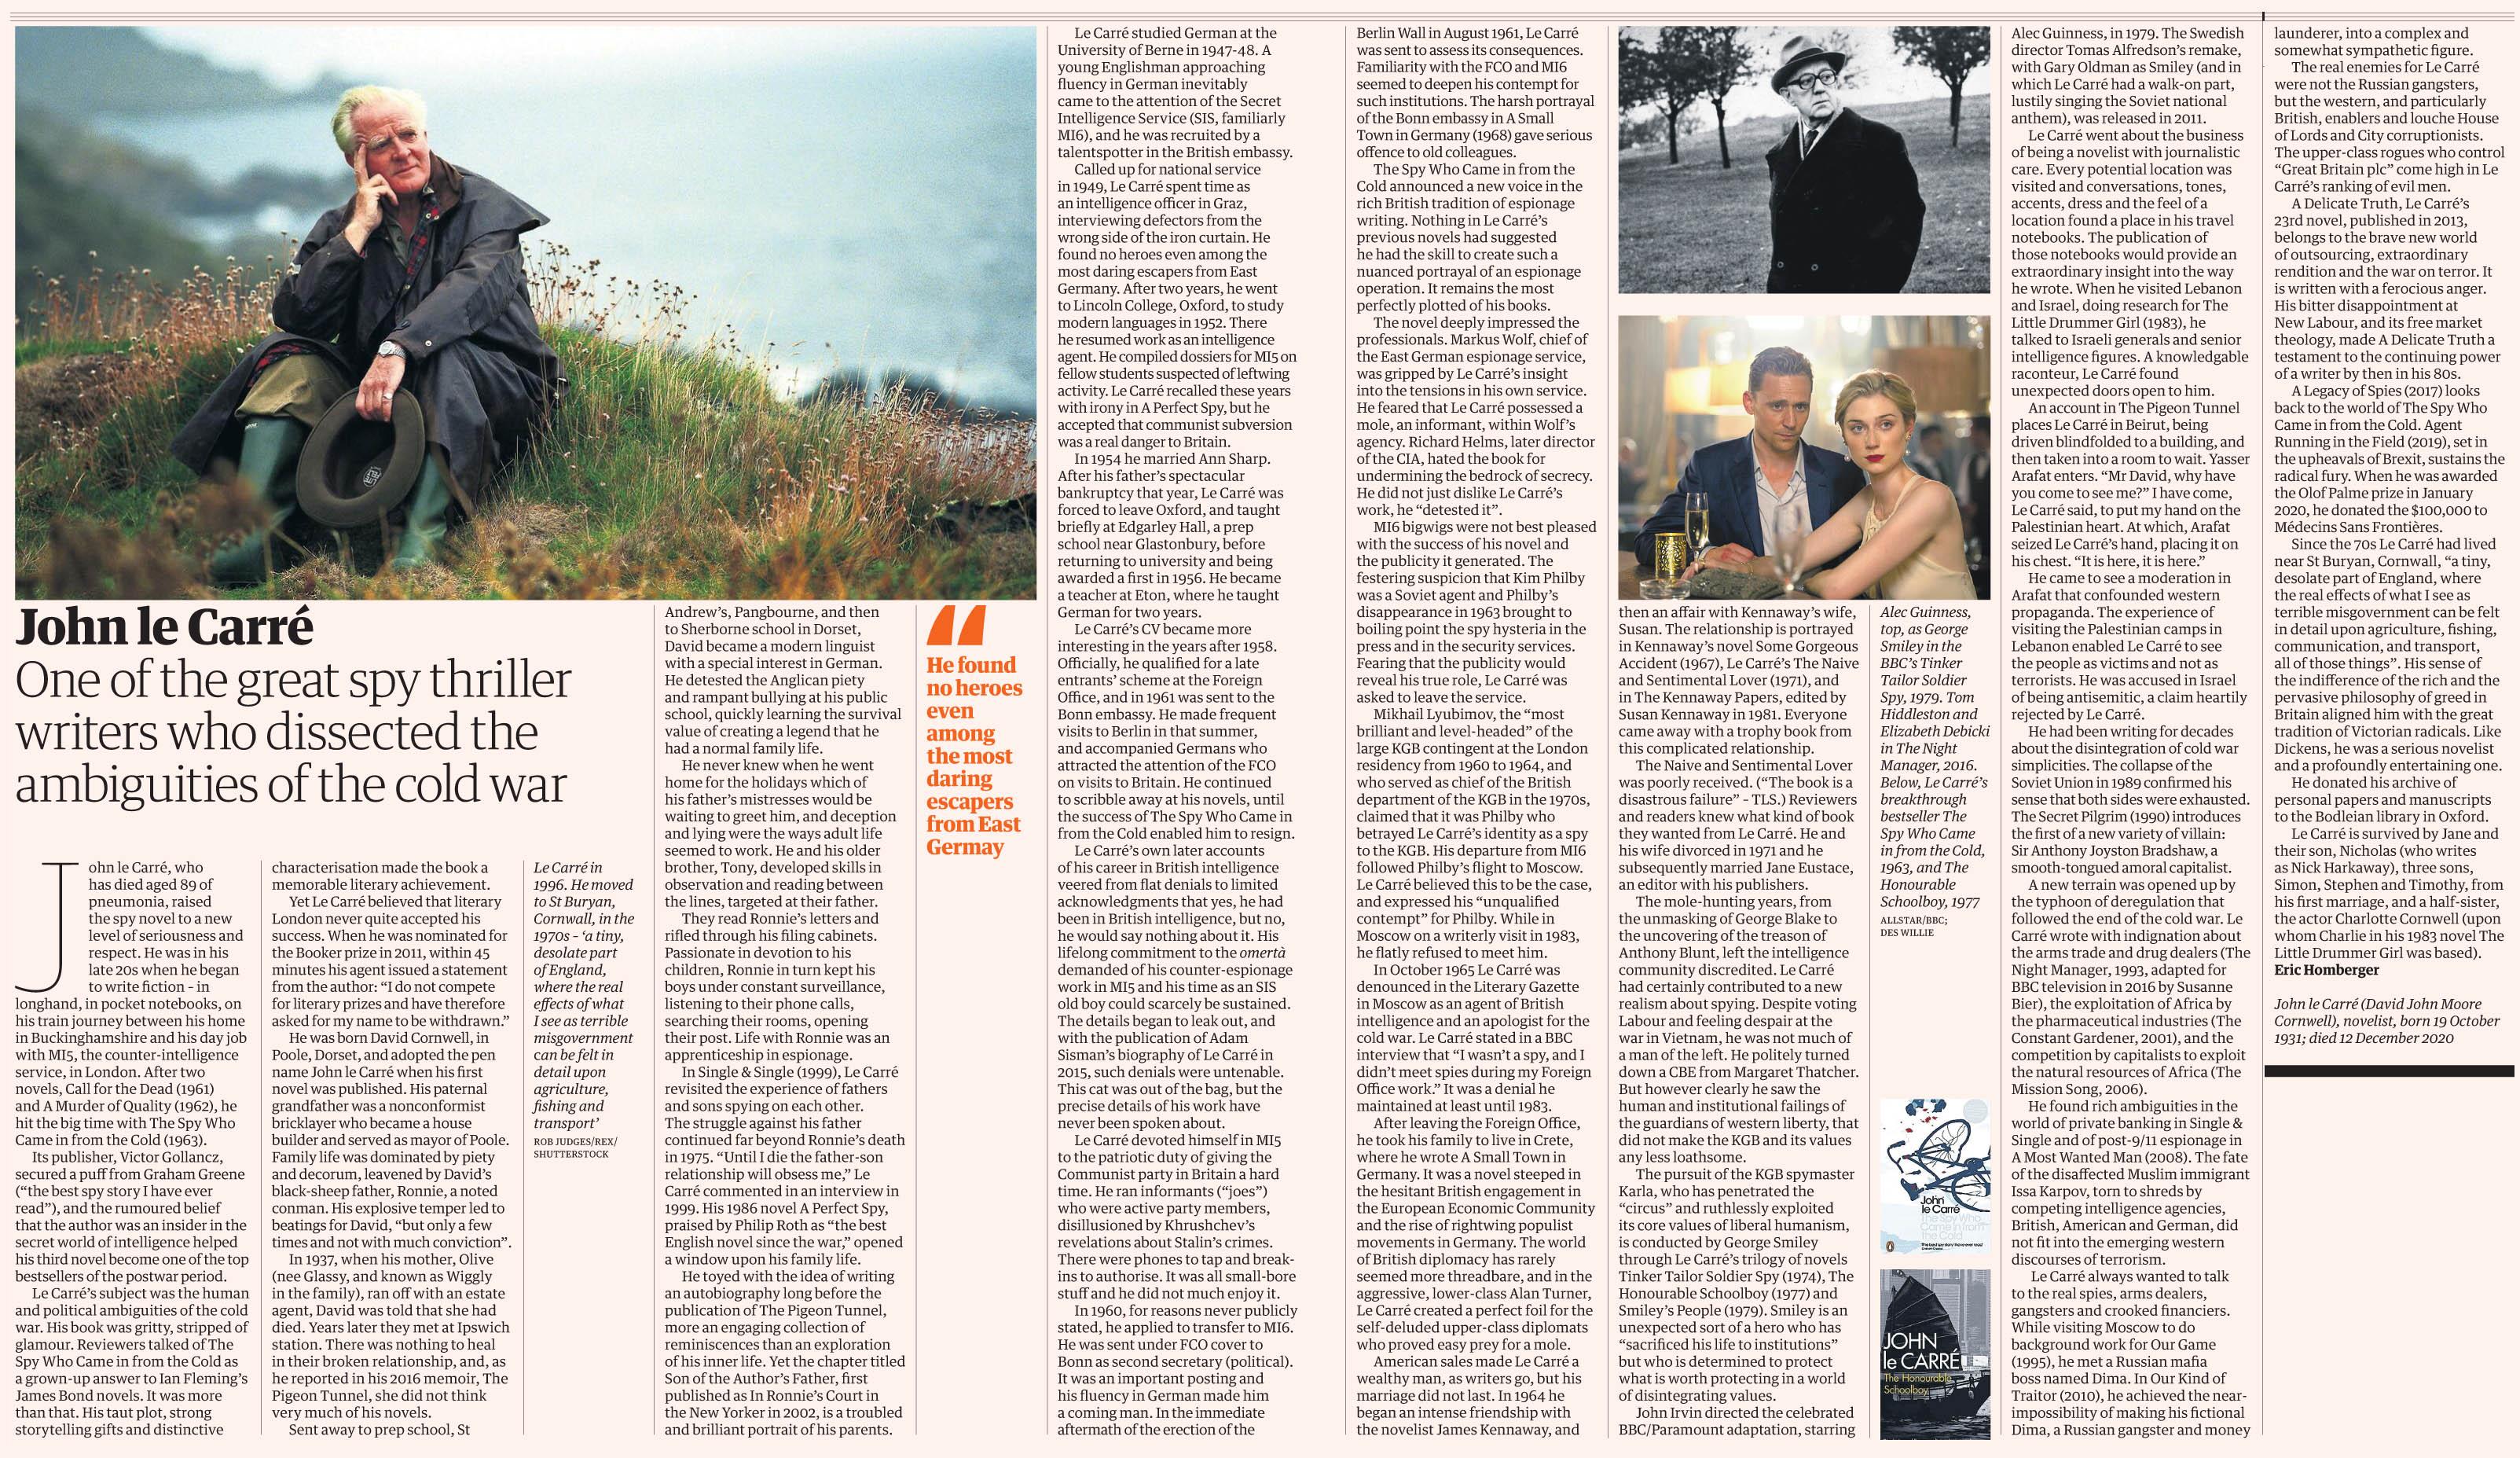 Guardian 201215 JLCarre2.jpg